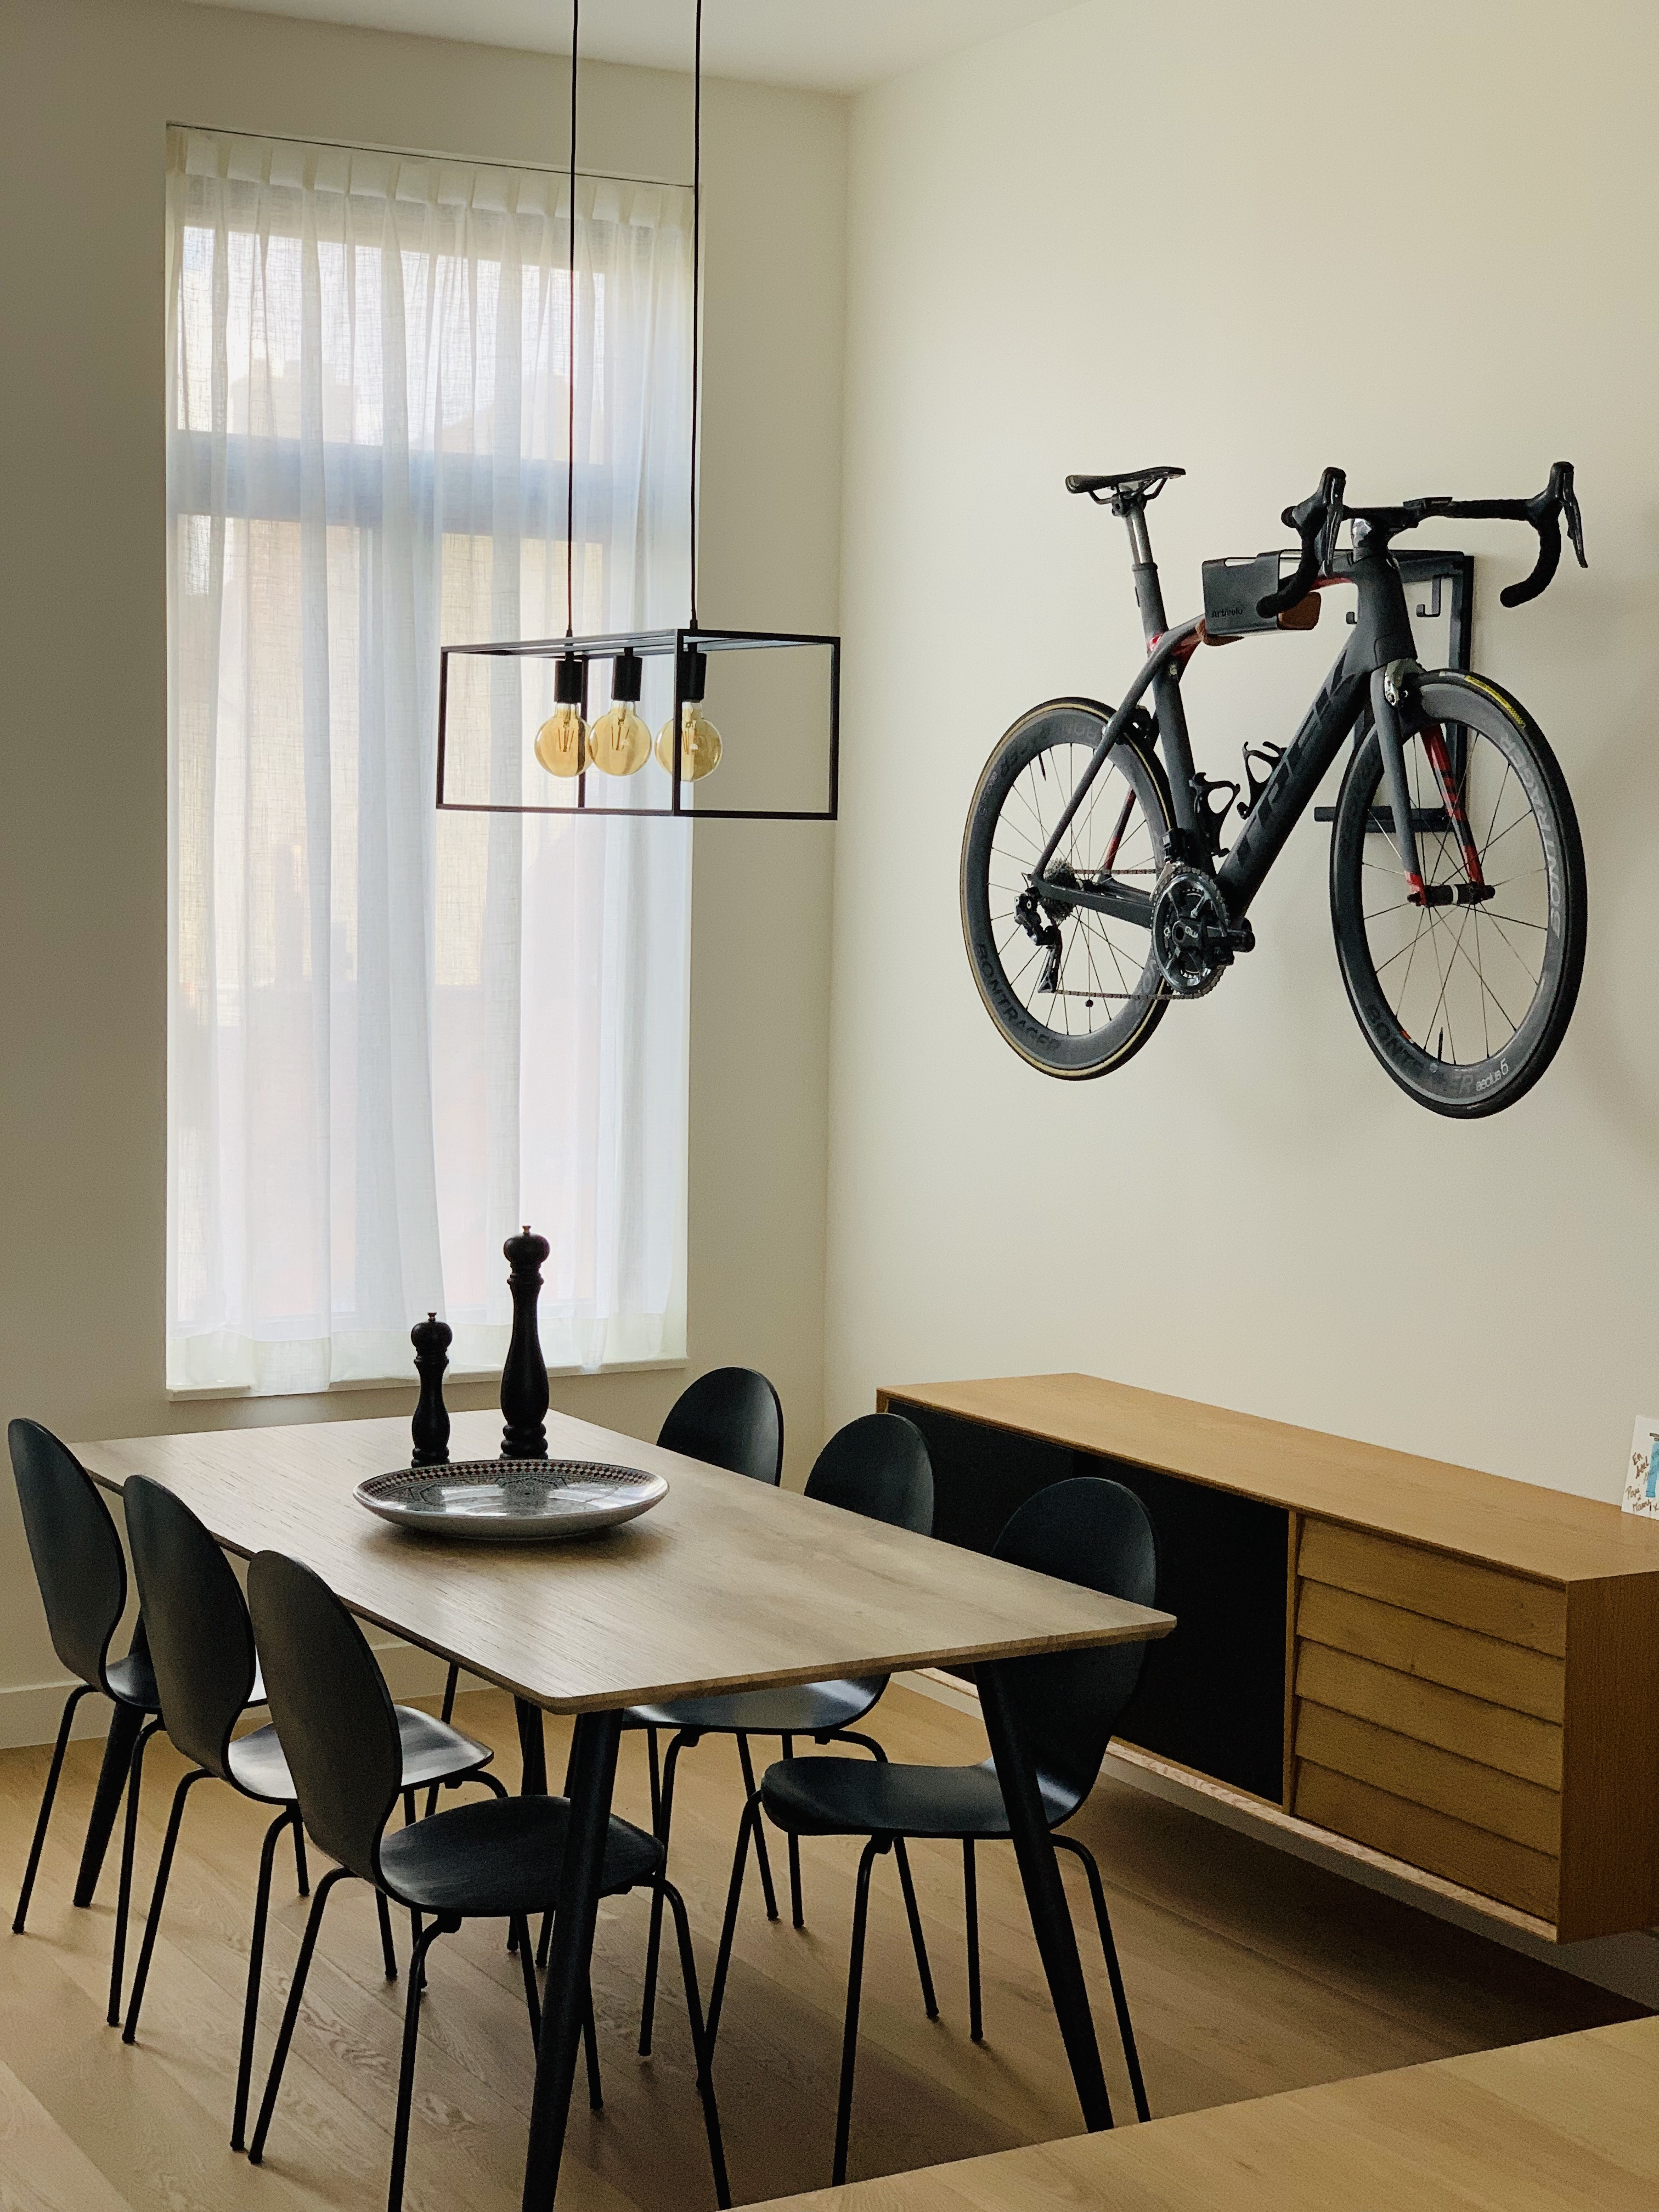 Your racing bike as an interior piece